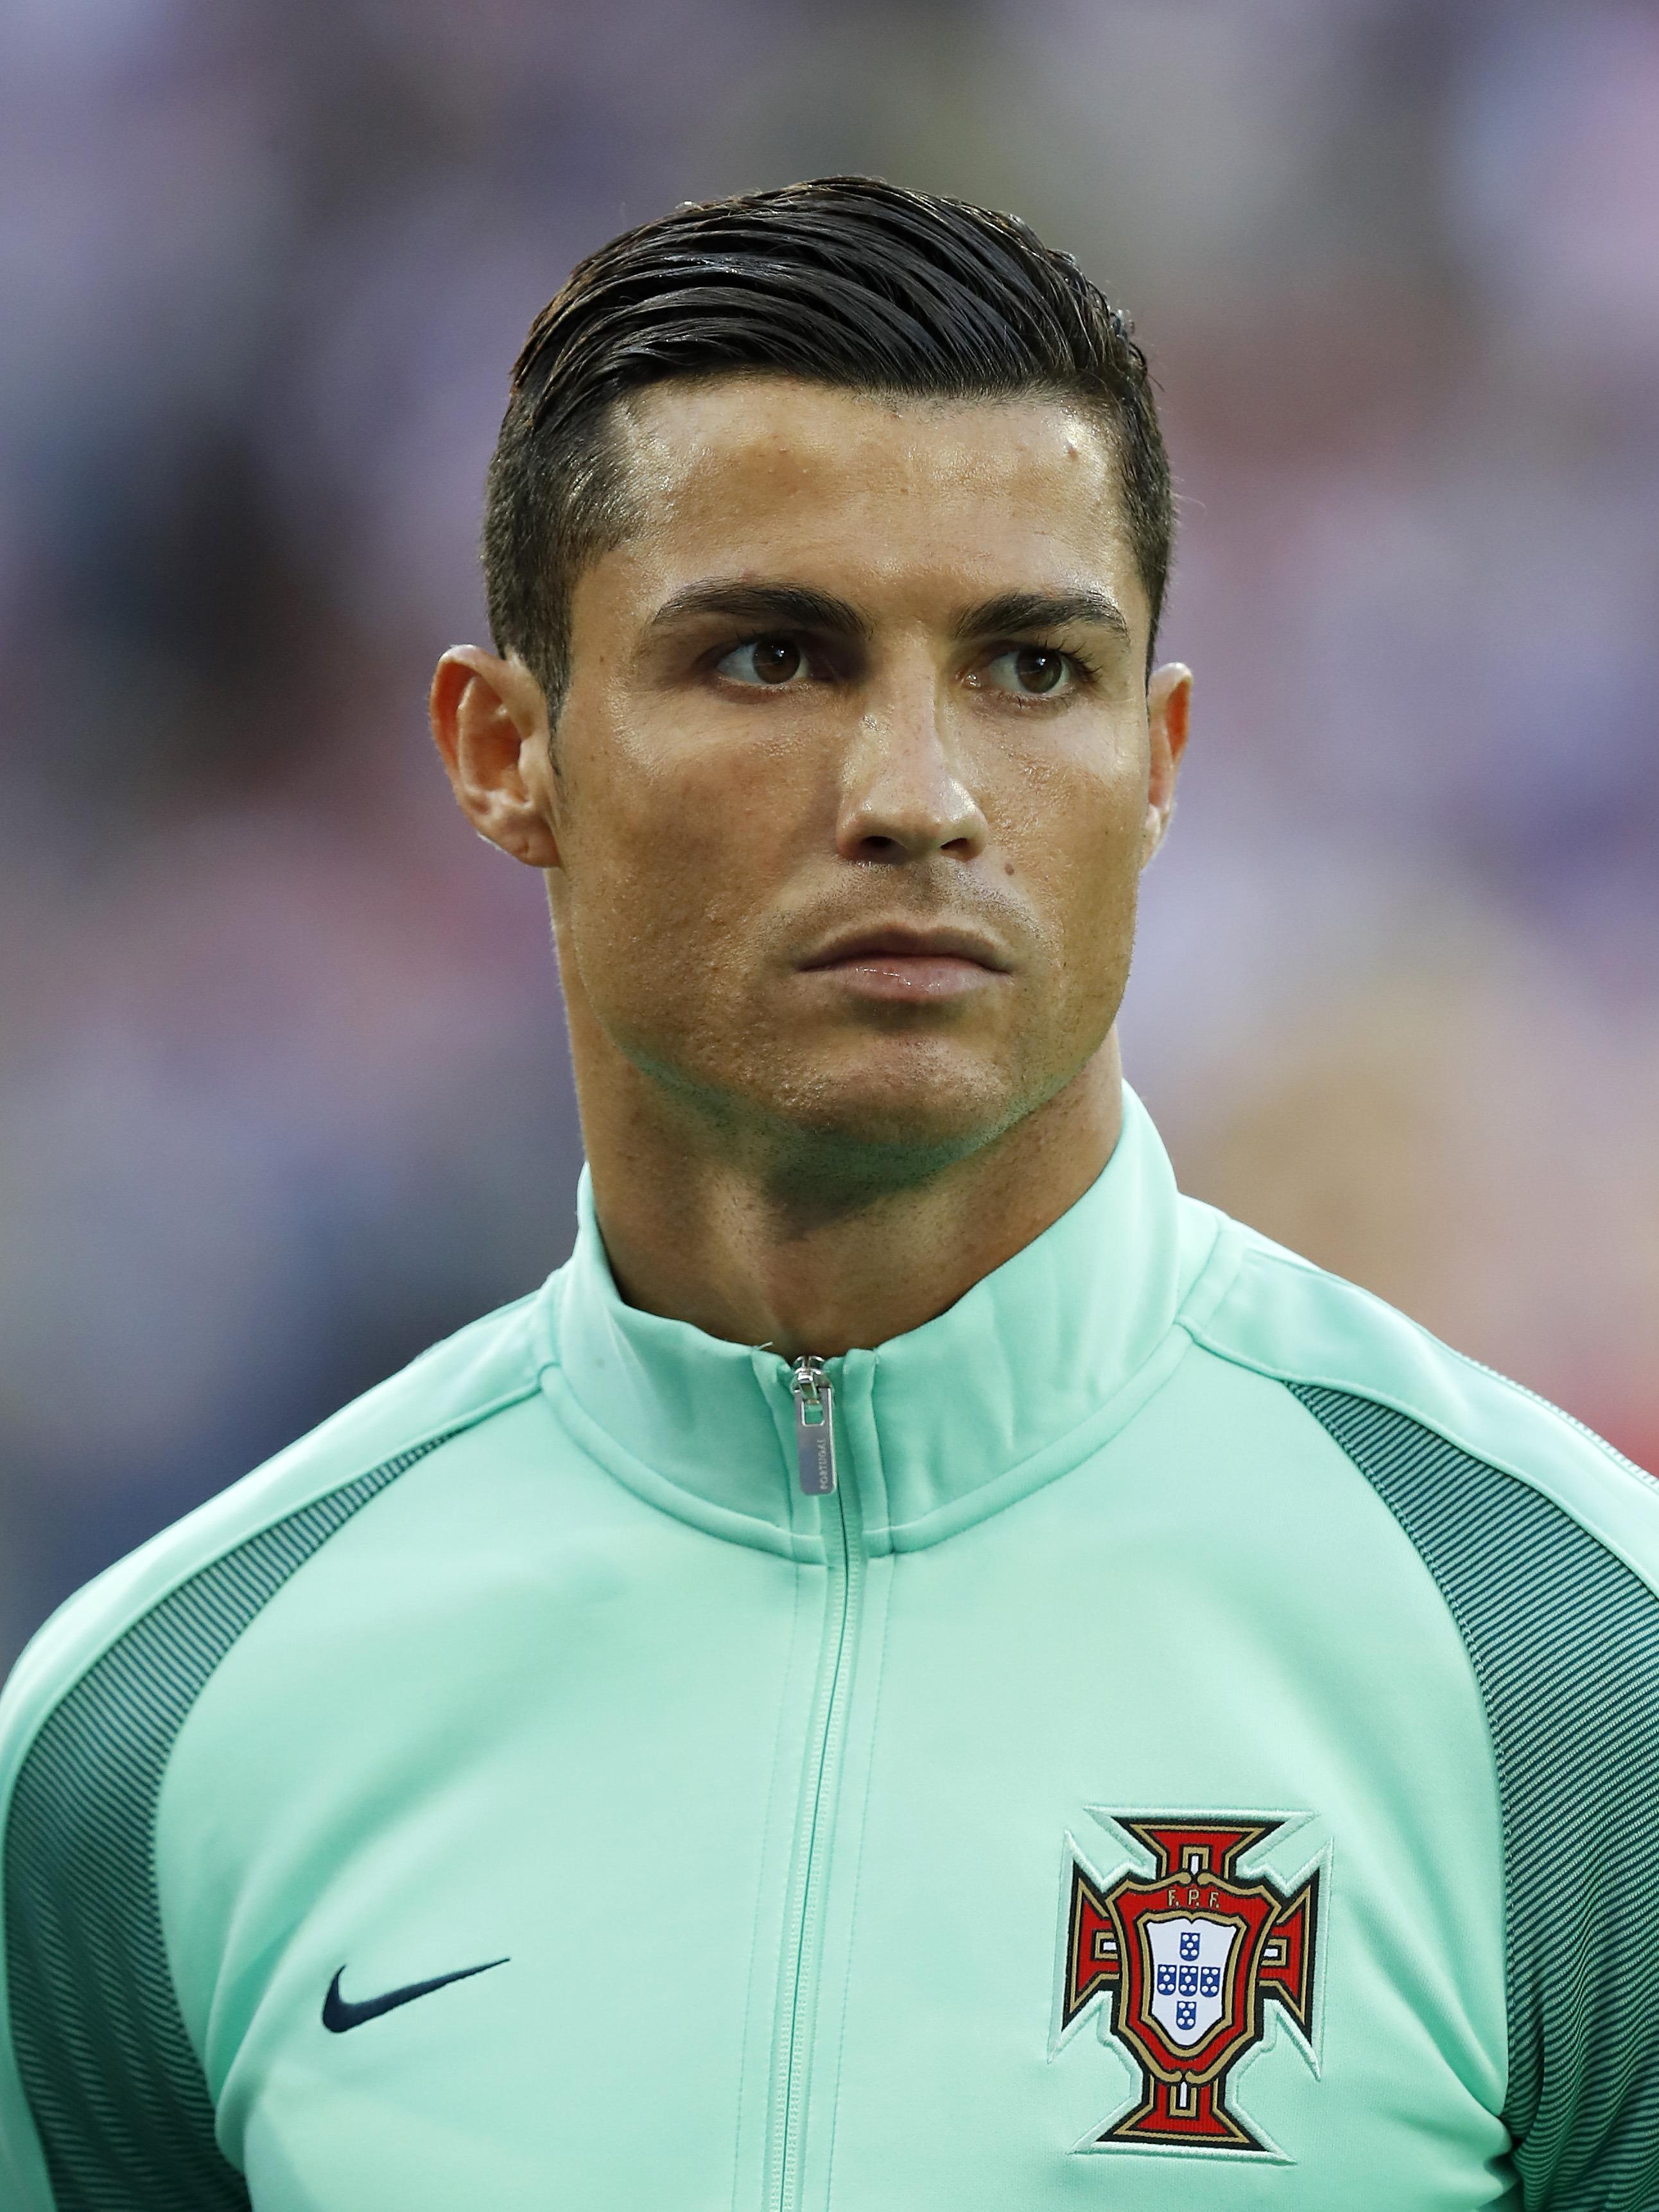 Cristiano Ronaldo Eyebrows : cristiano, ronaldo, eyebrows, Cristiano, Ronaldo, Plastic, Surgery, Transform, Himself, Goofy, Preening, Superstar?